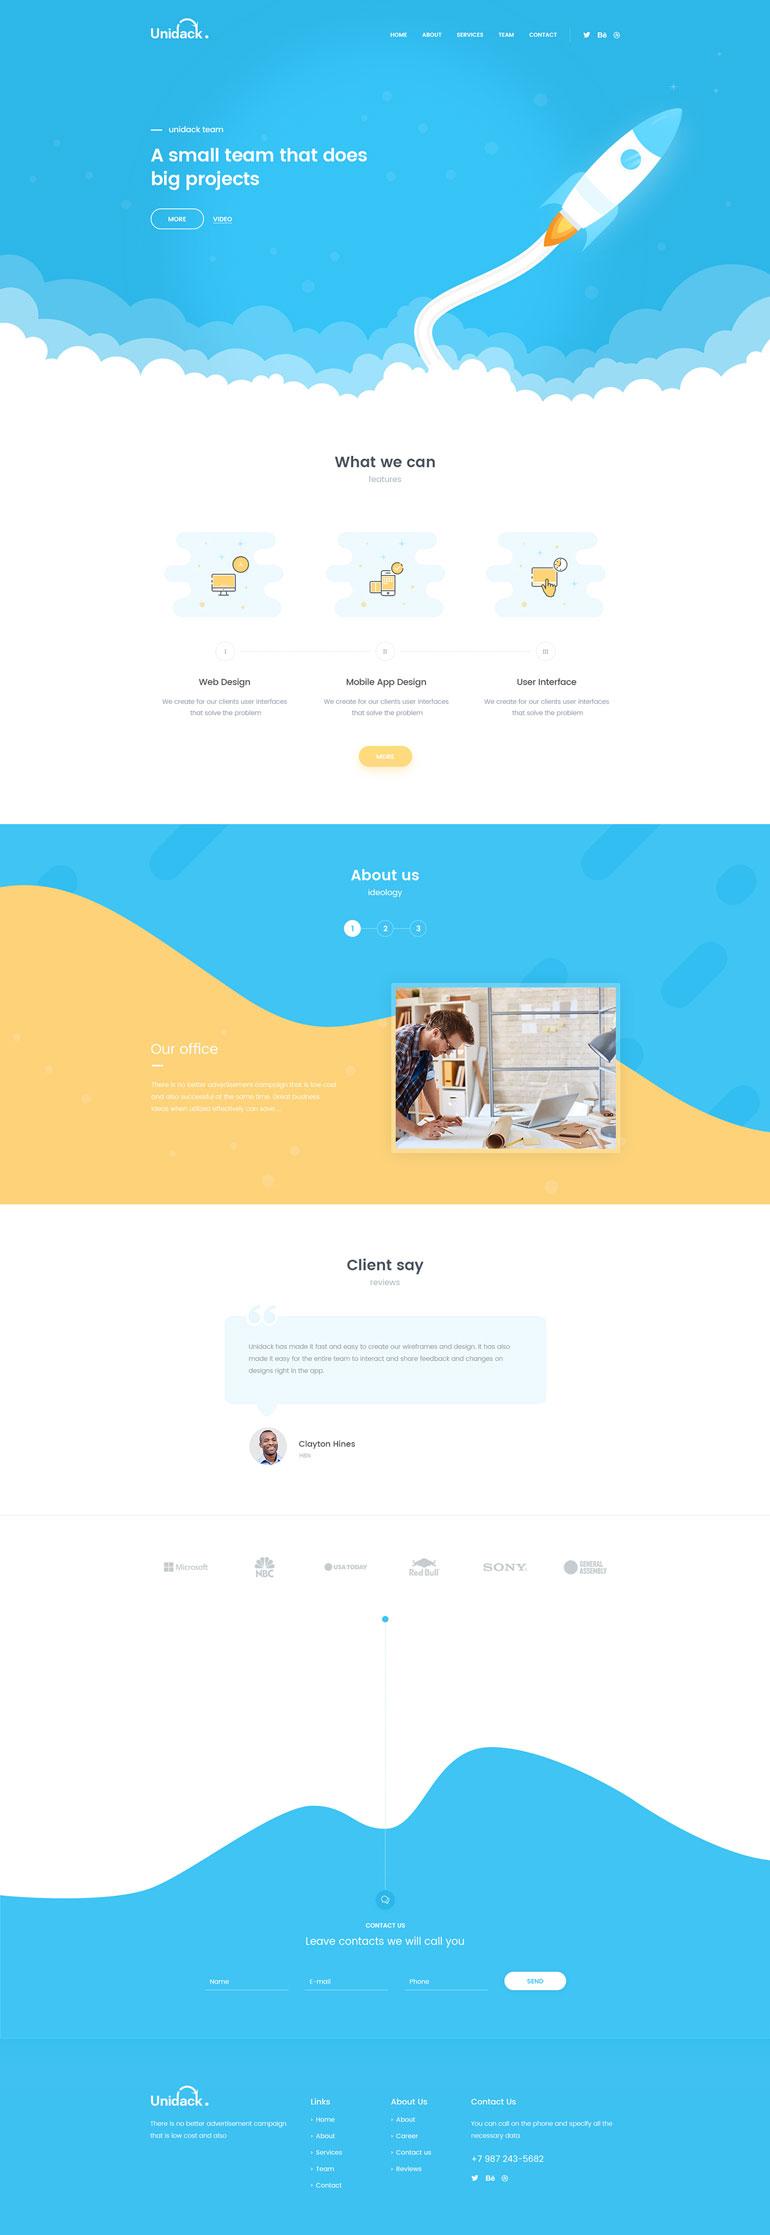 Creative_Website_Design_Inspiration_2016_010